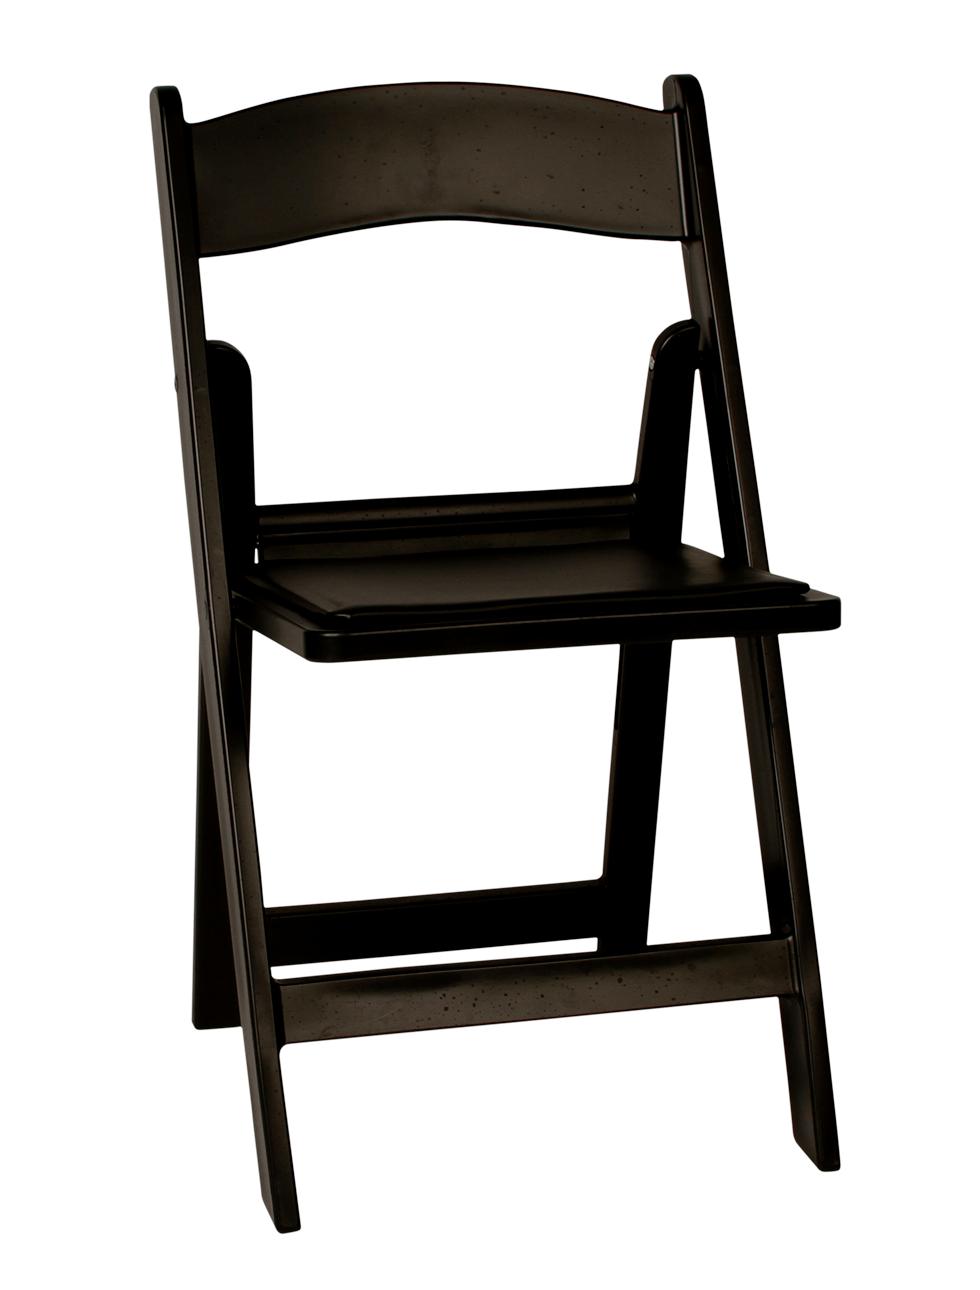 Resin Black Folding Chair Rental Bright Rentals